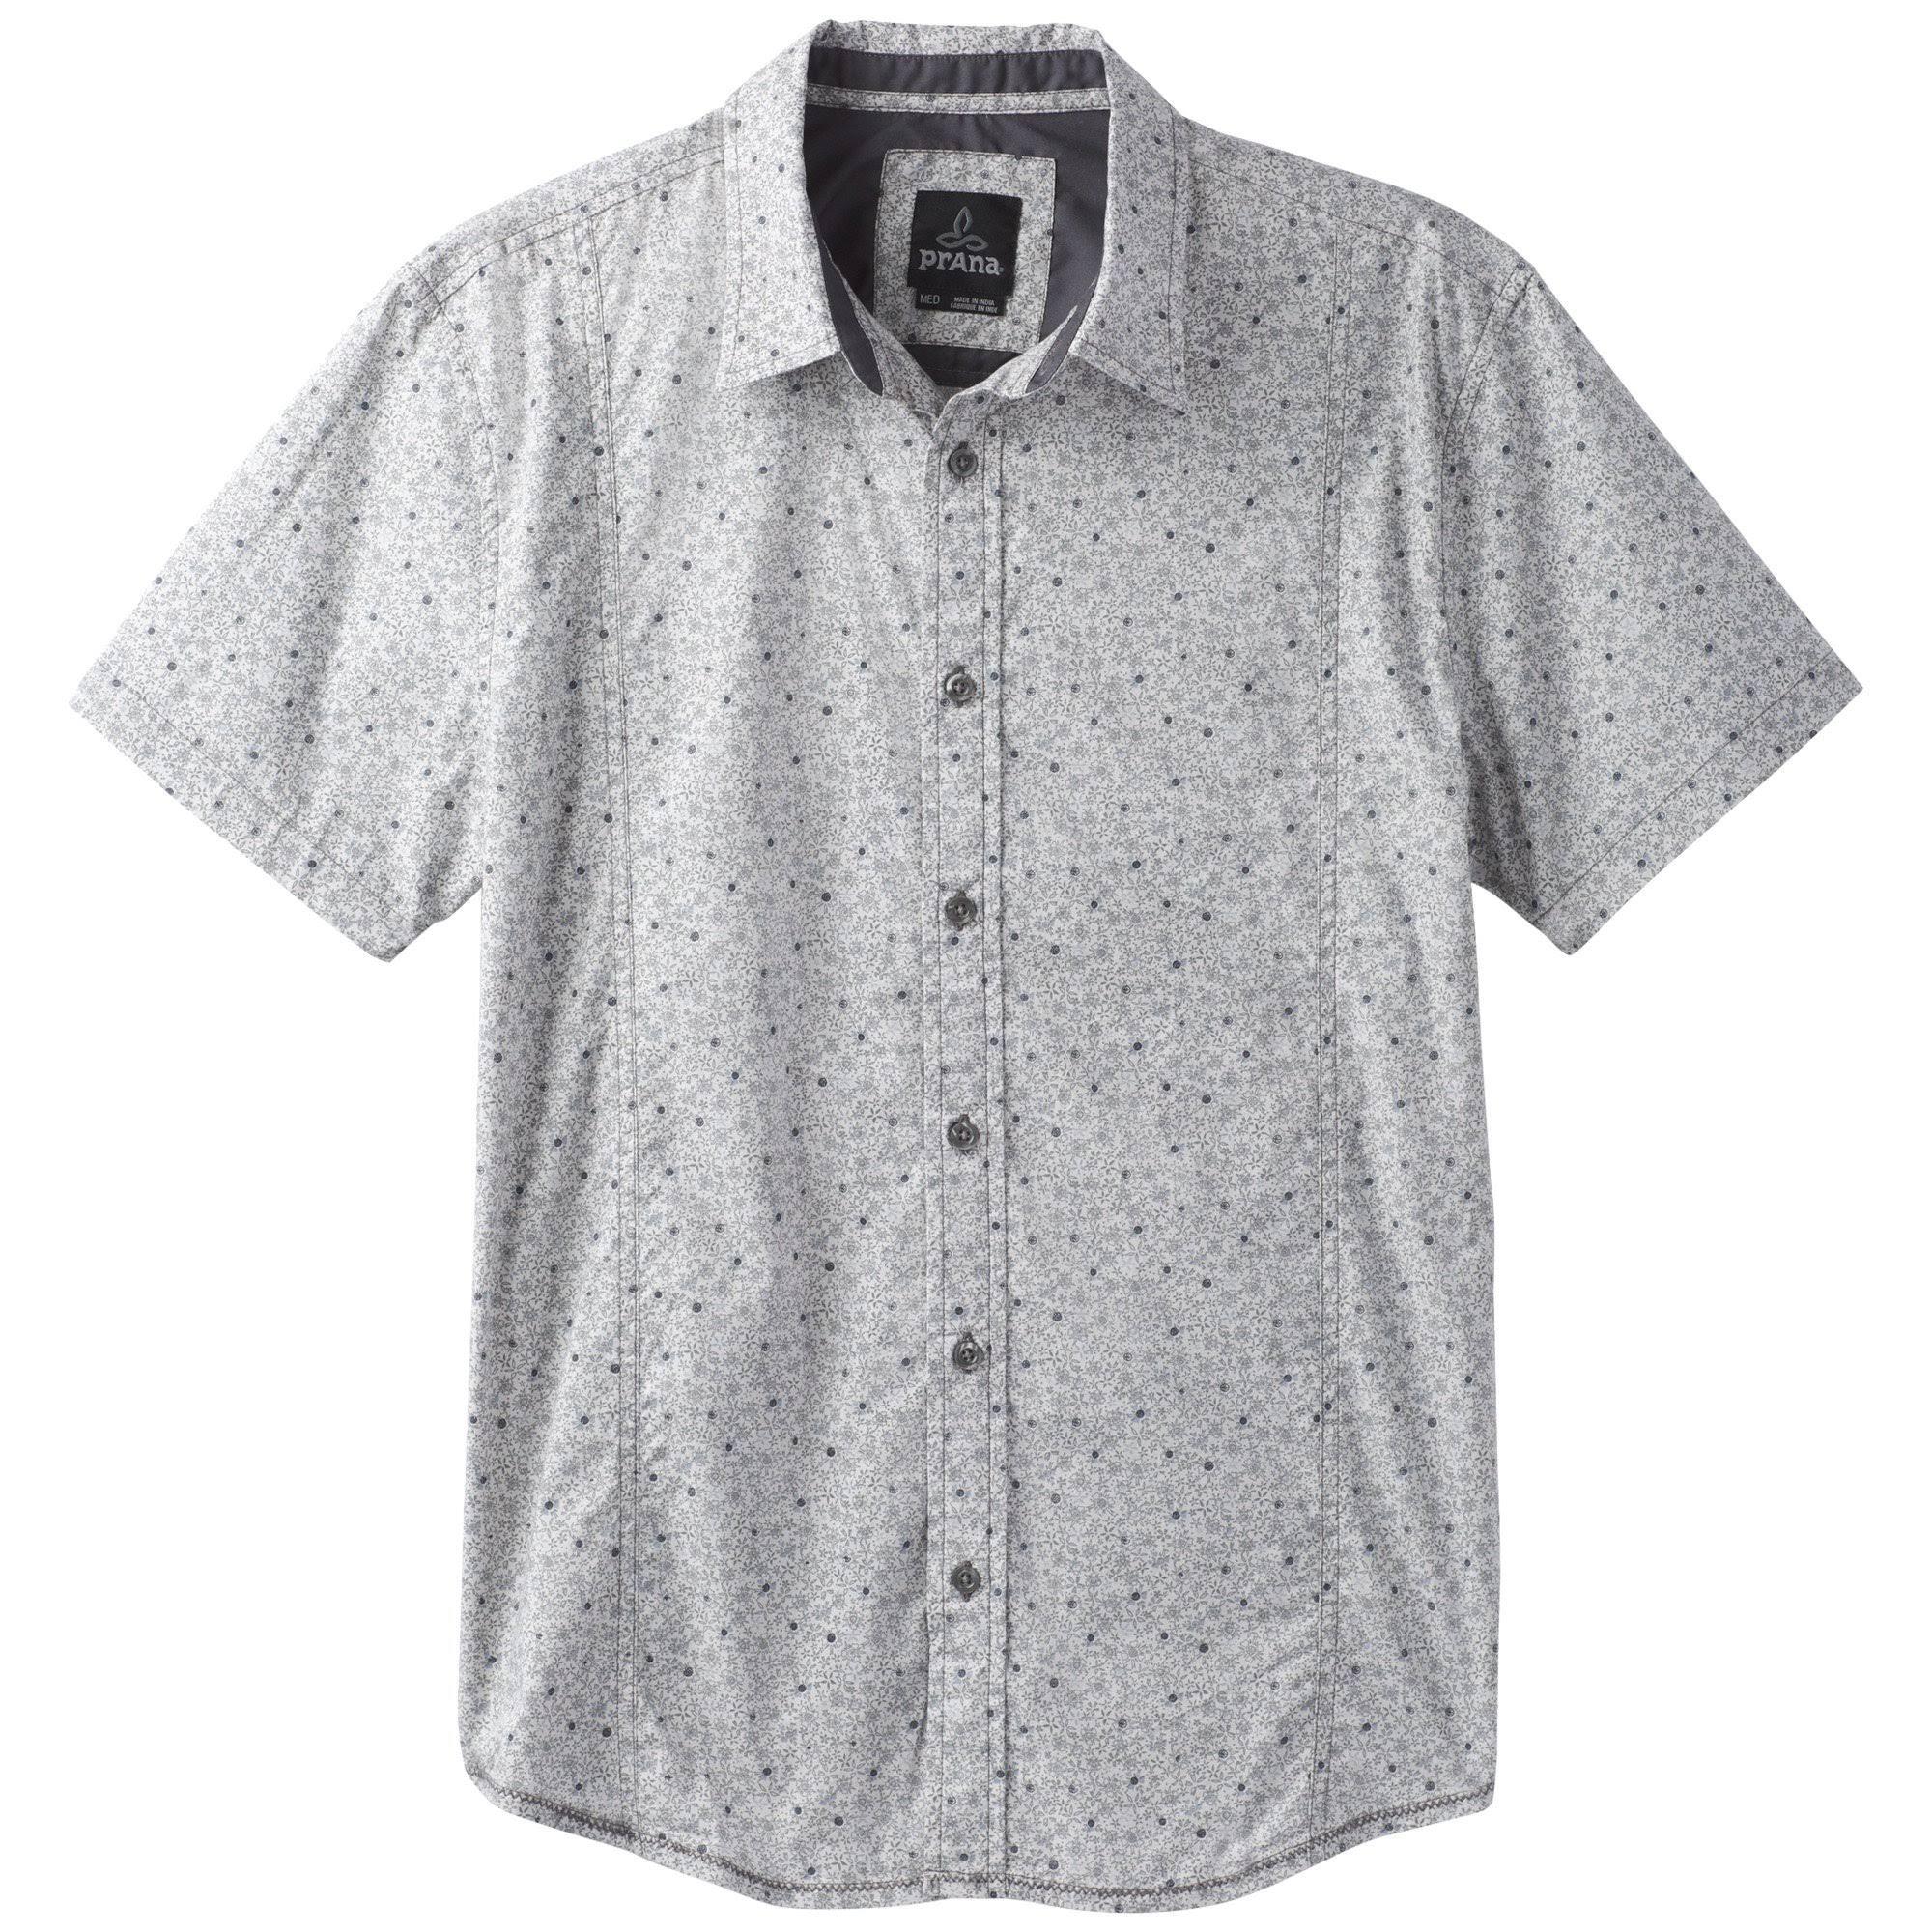 Hombre Lukas M Prana Grava Camisa t0v5wfxqn